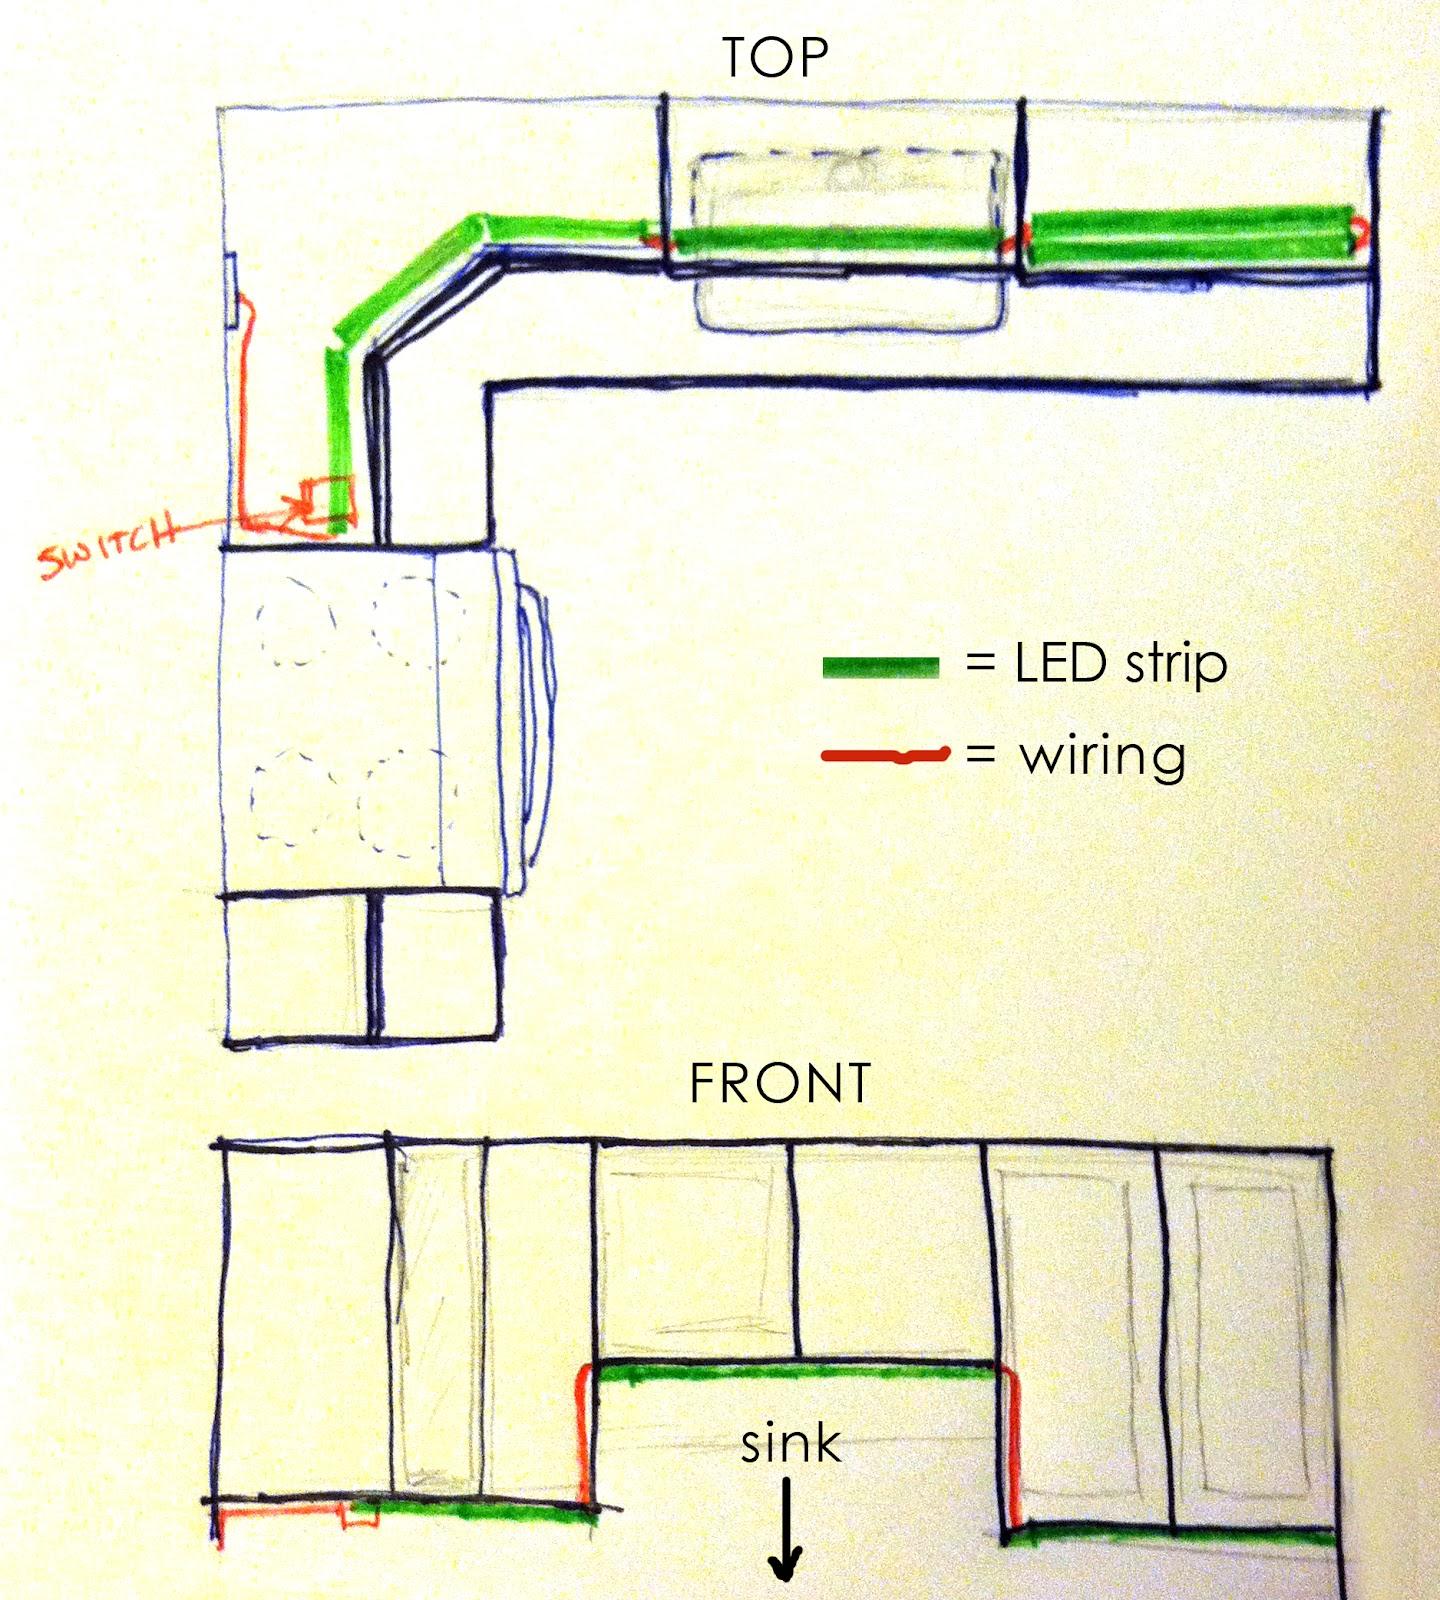 cabinetlighting Under Cabinet Led Light Wiring Diagram on wiring under cabinet microwave, wiring recessed led lights, wiring low voltage led lights, wiring home led lights,